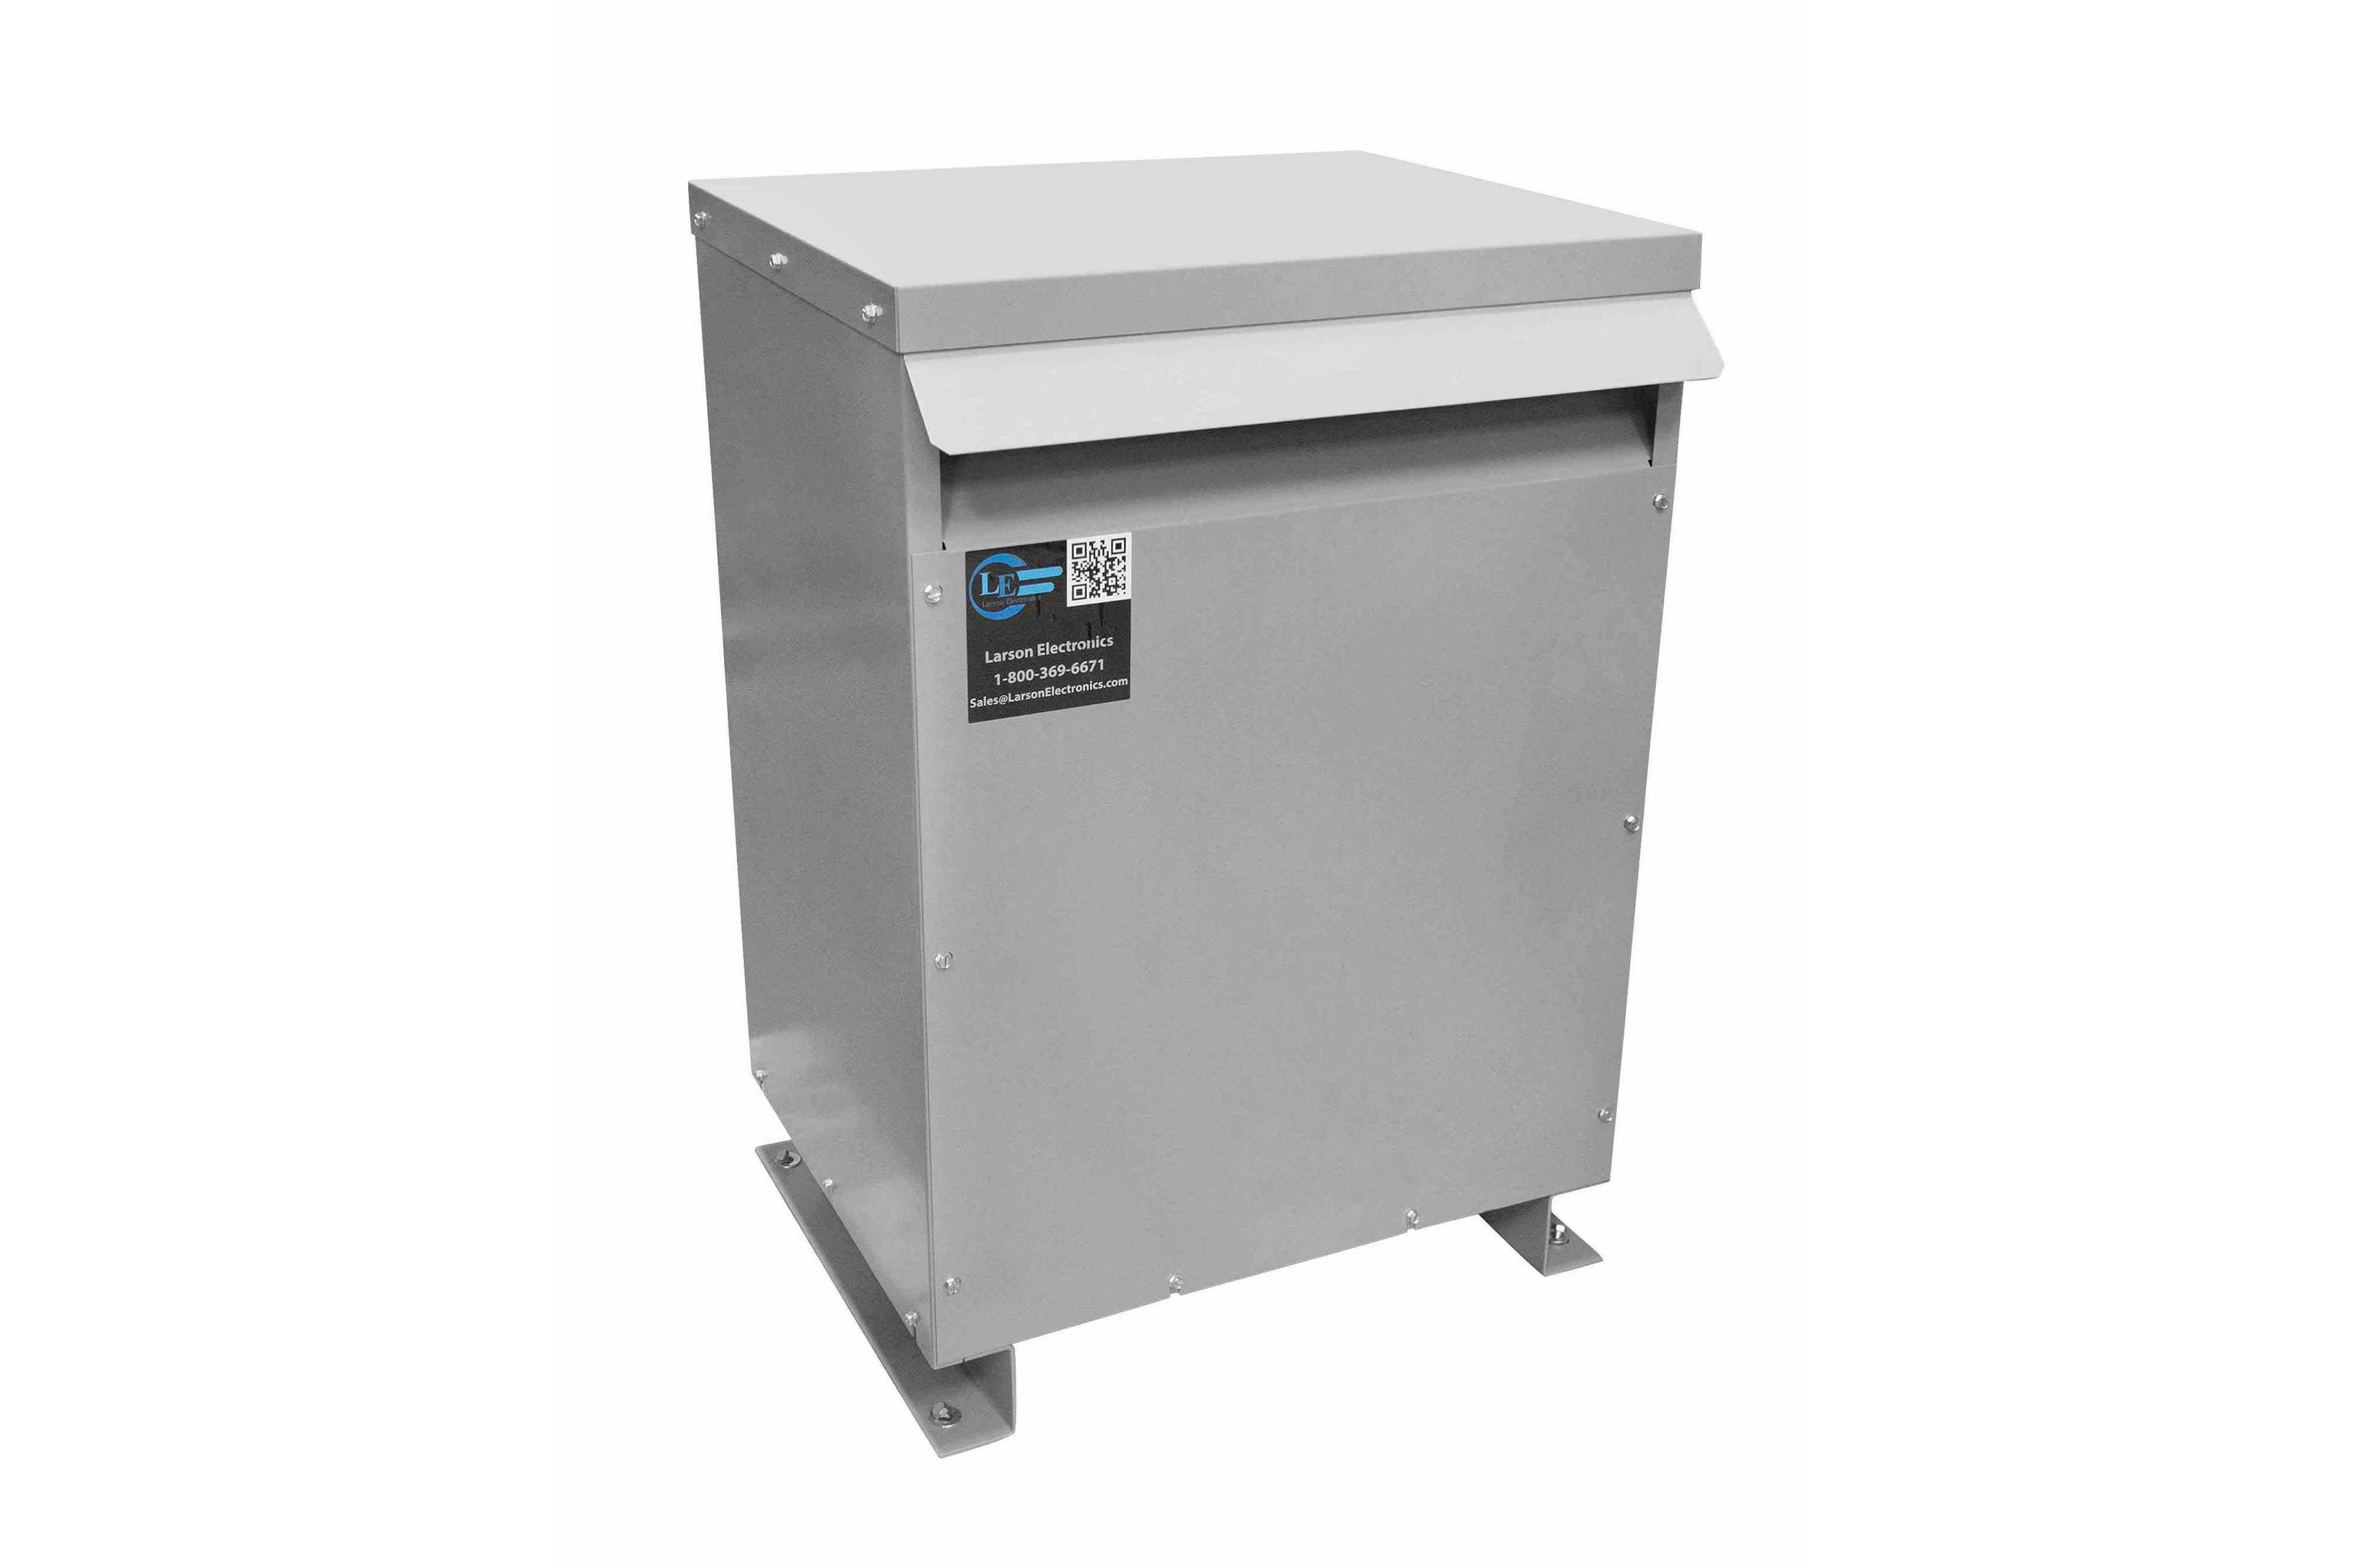 42.5 kVA 3PH Isolation Transformer, 400V Wye Primary, 600V Delta Secondary, N3R, Ventilated, 60 Hz